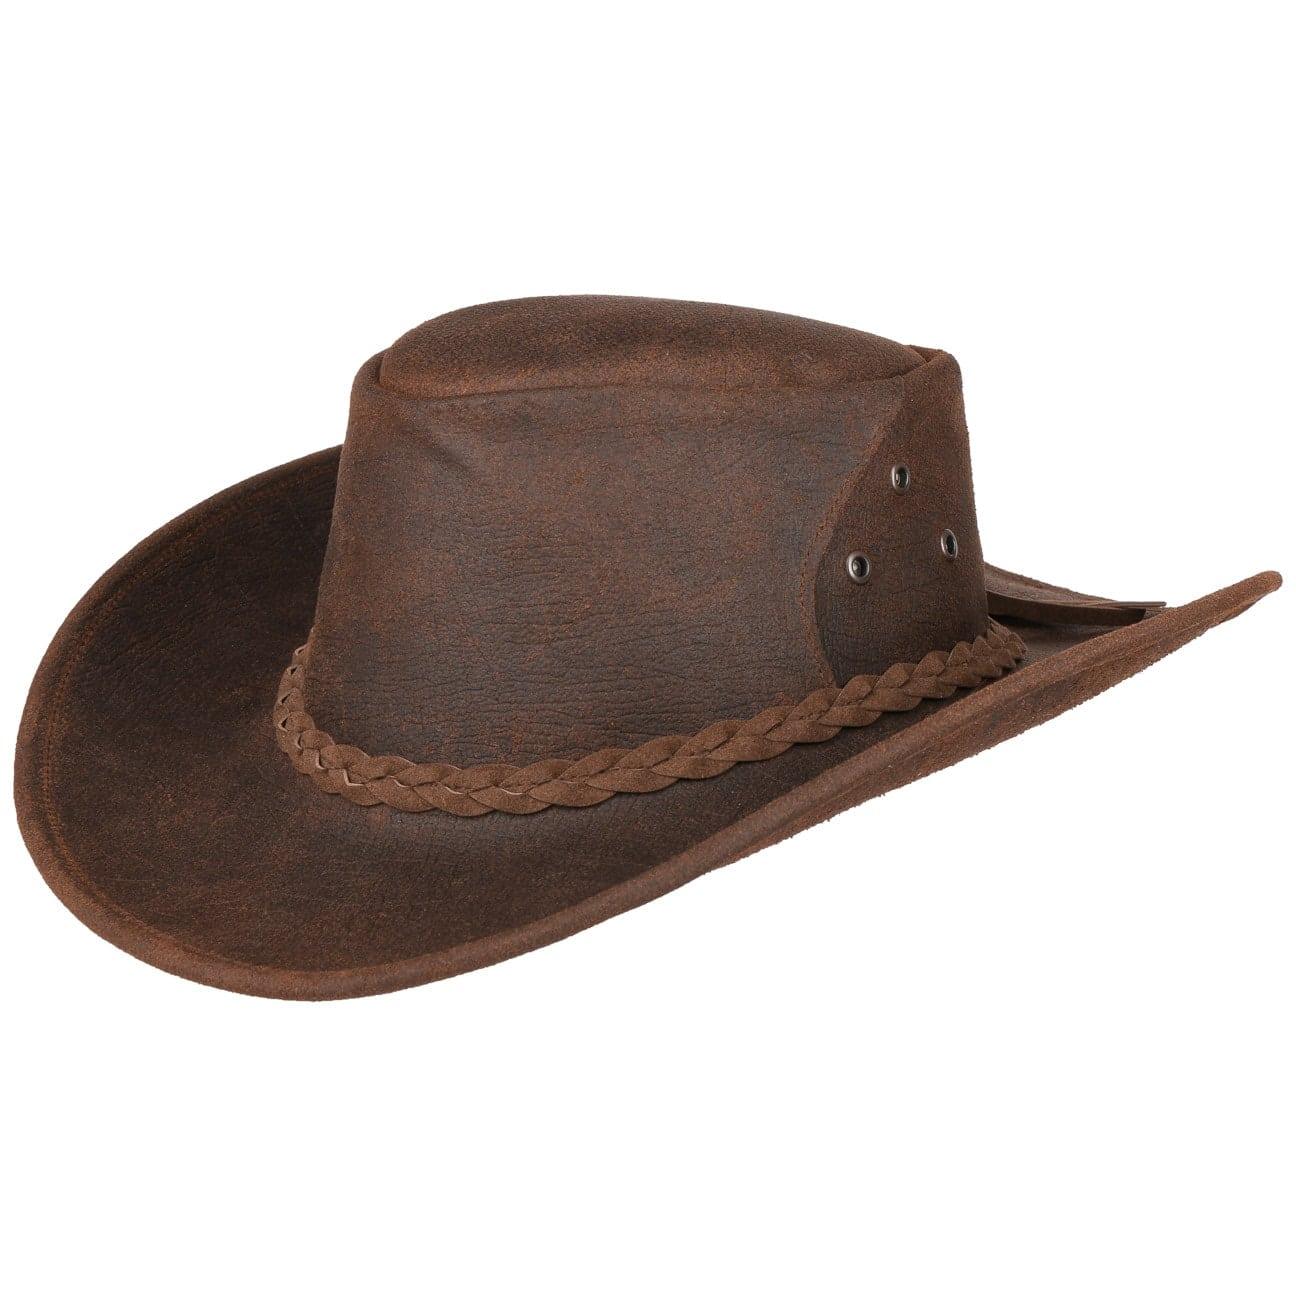 Sombrero de Piel Bulldog by Kakadu Traders  sombrero outback